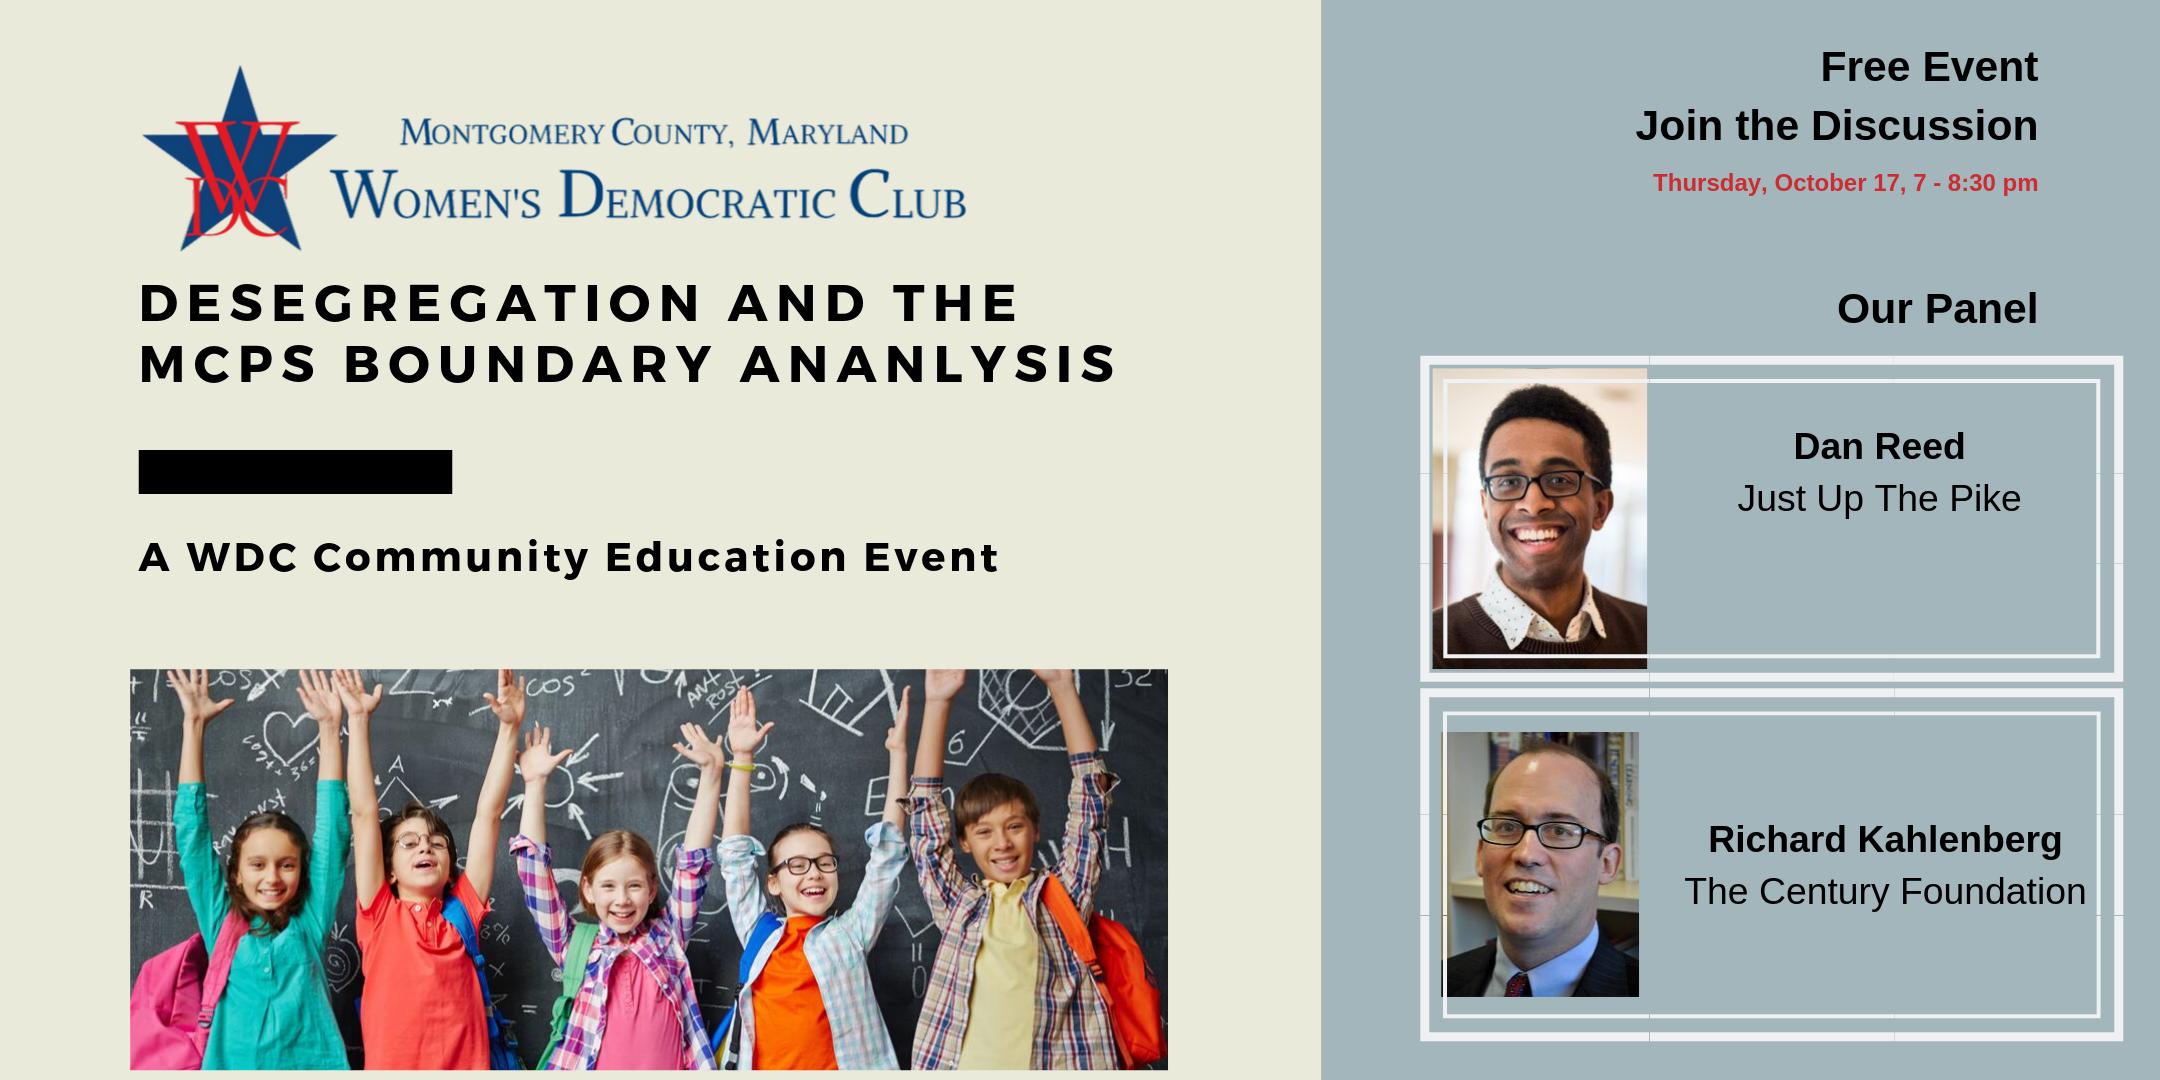 revised WDC Community Education Event Eventbrite.png